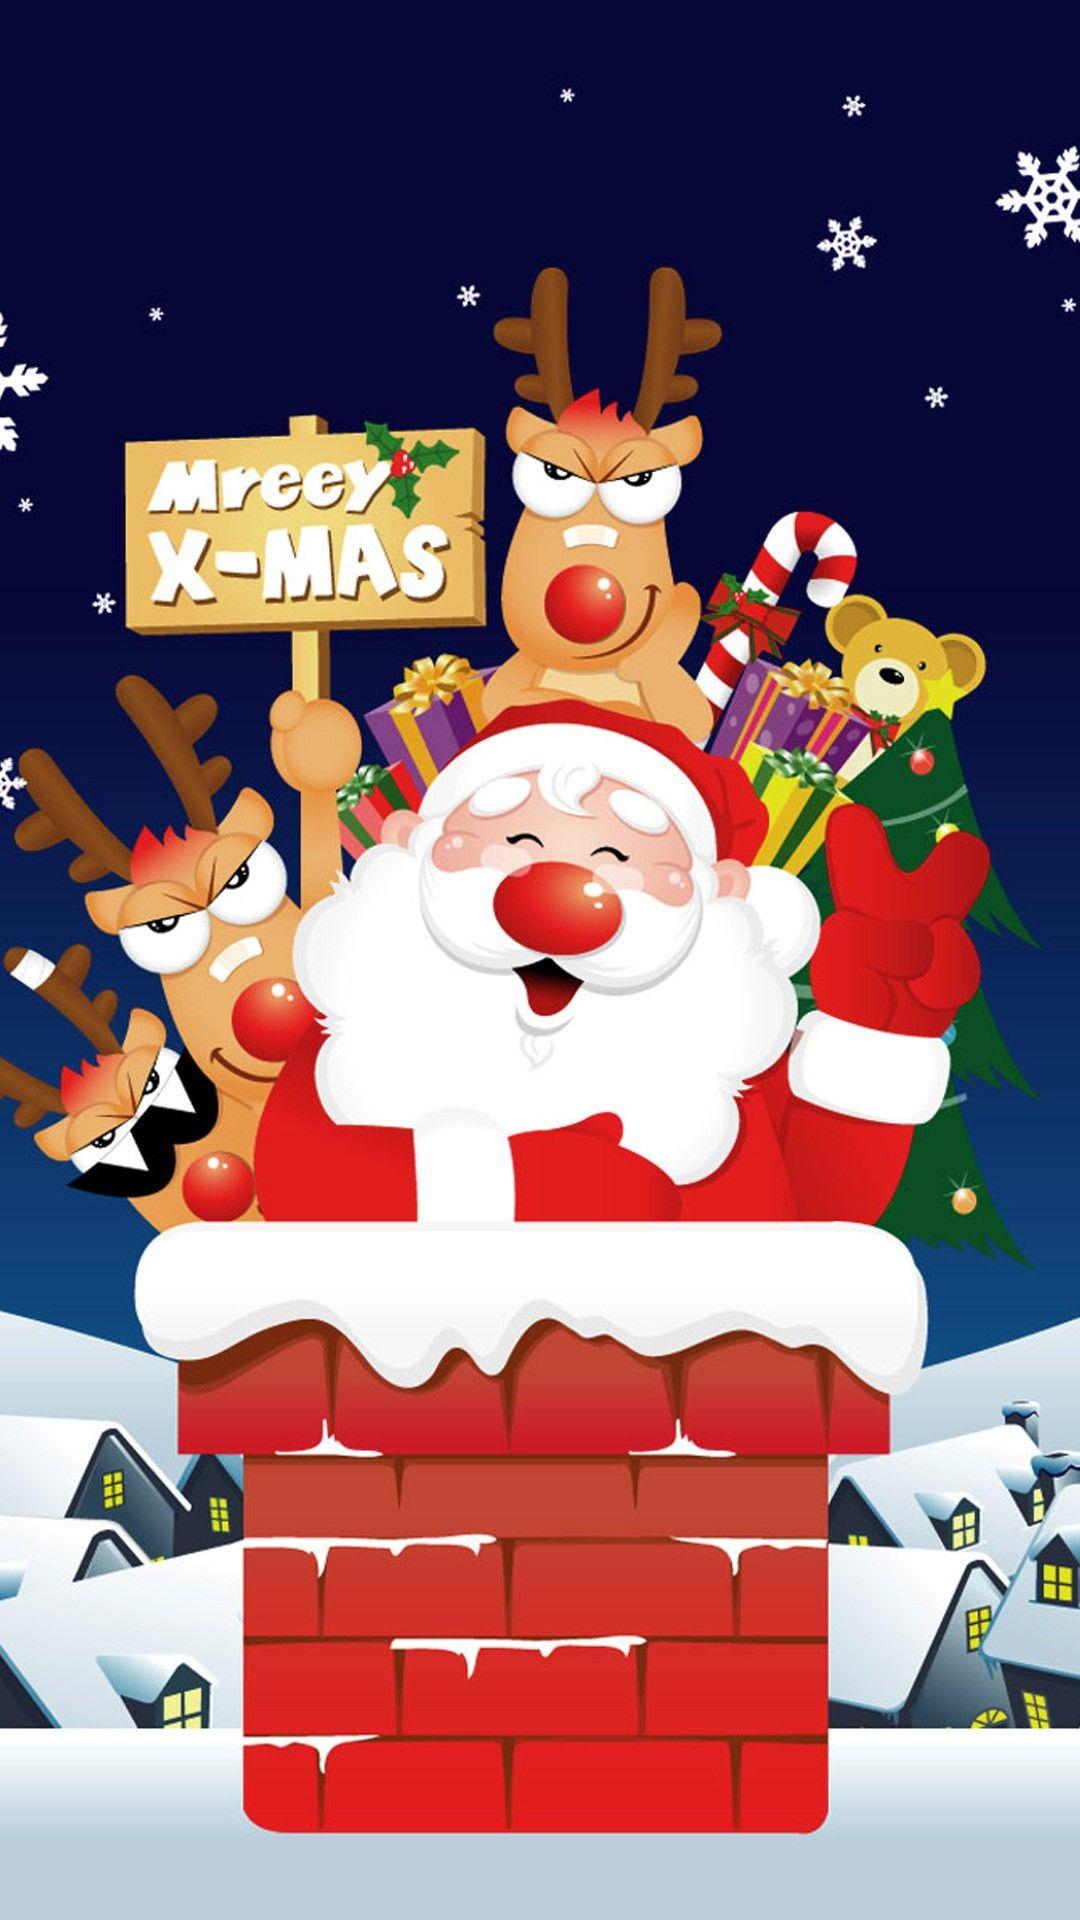 merry x-mas santa on the roof christmas iphone 6 plus wallpaper